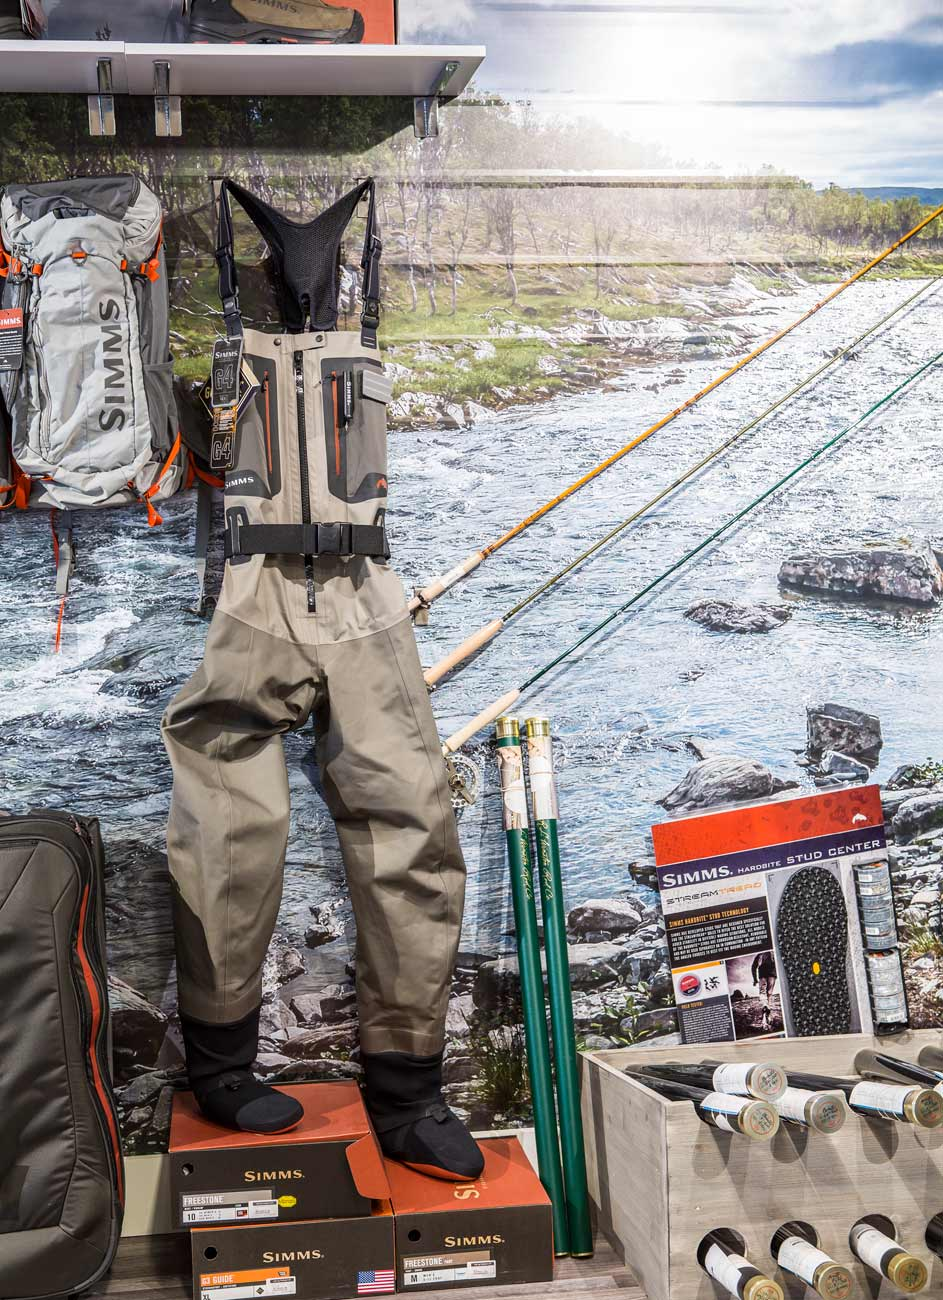 skien-by-jakt-fjellsport-vadebukse-fiskeutstyr